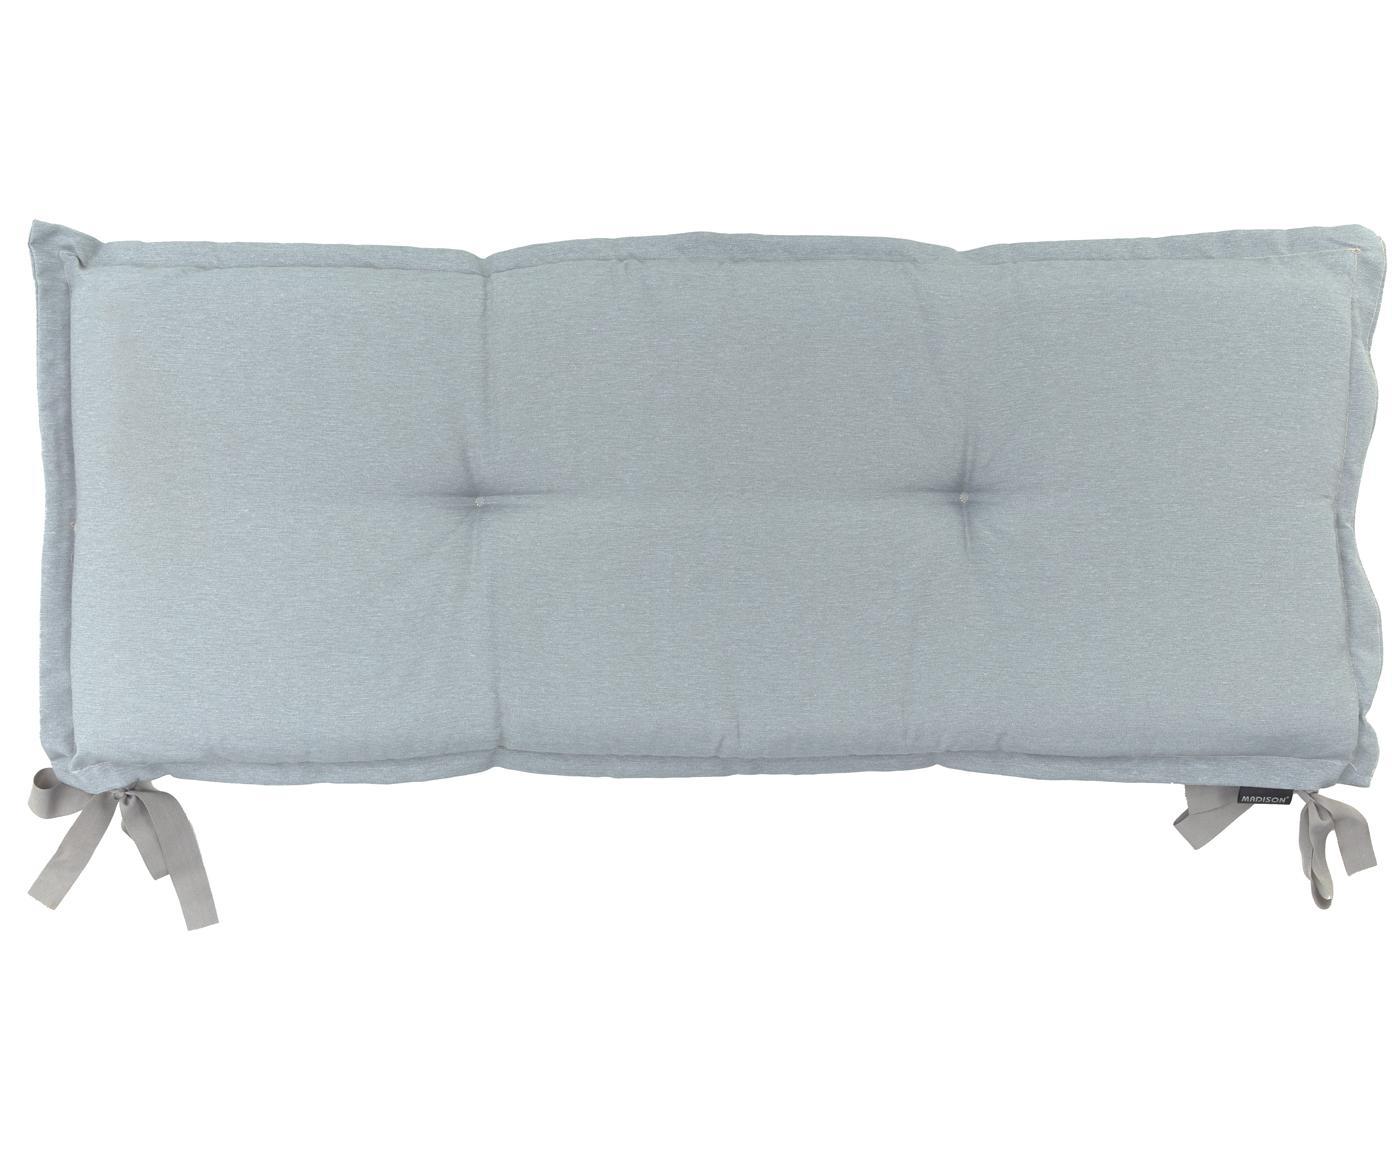 Einfarbige Bankauflage Panama, 50% Baumwolle, 45% Polyester, 5% andere Fasern, Hellgrau, 48 x 120 cm